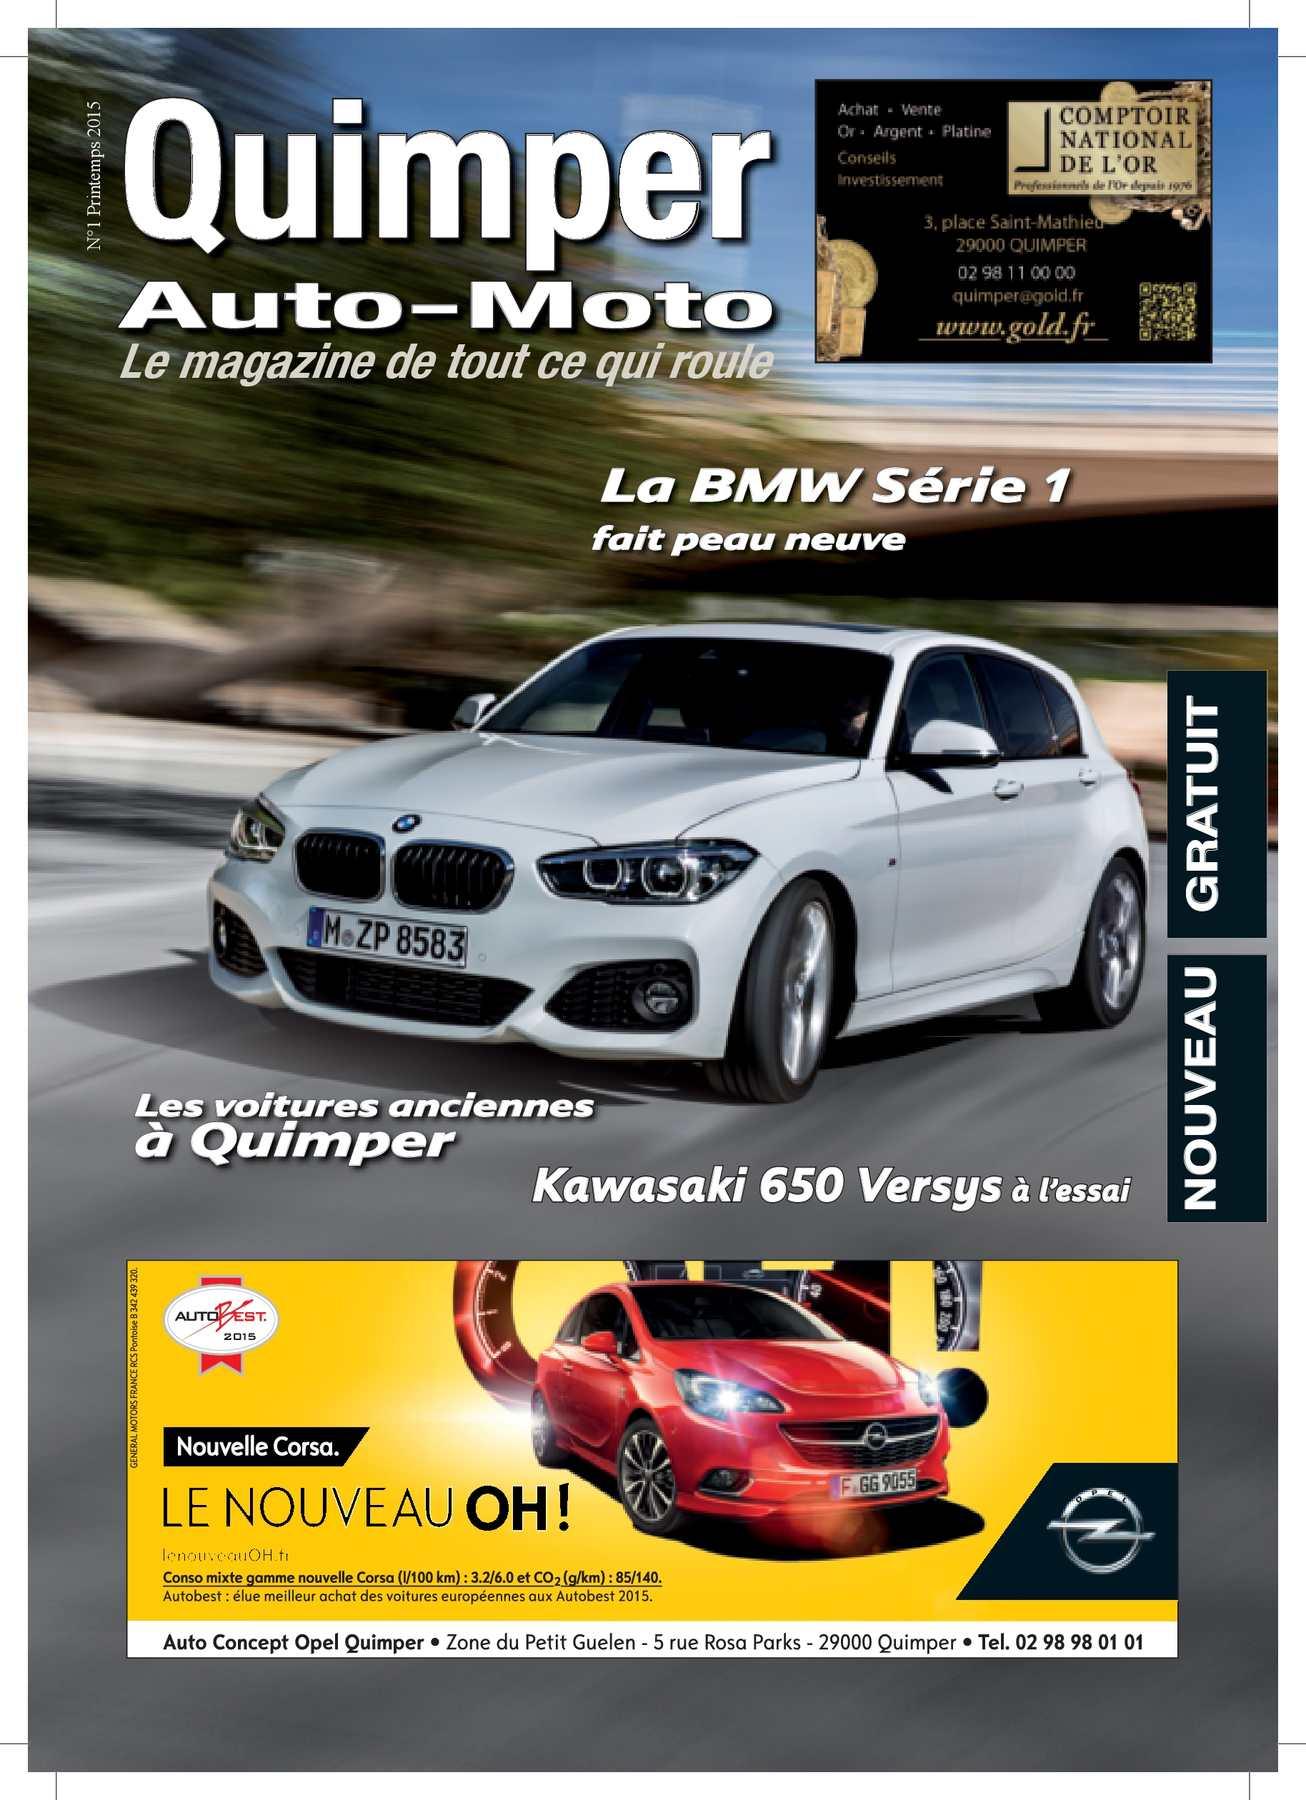 Calaméo - Quimper Auto Moto Numéro 1 c480980489d